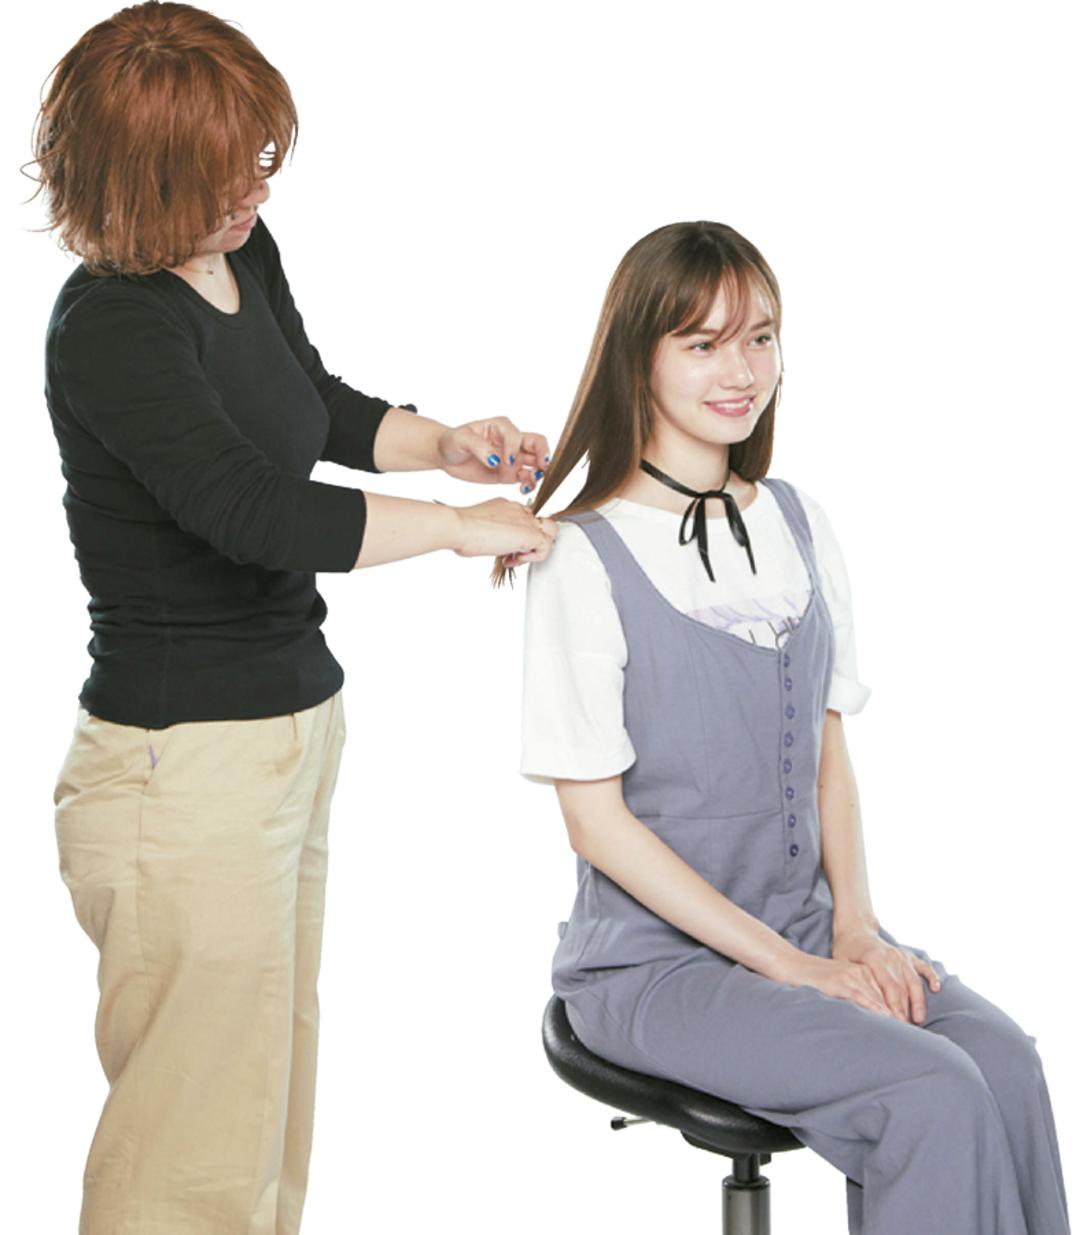 JK節約テク④ カットモデルになって髪を切る